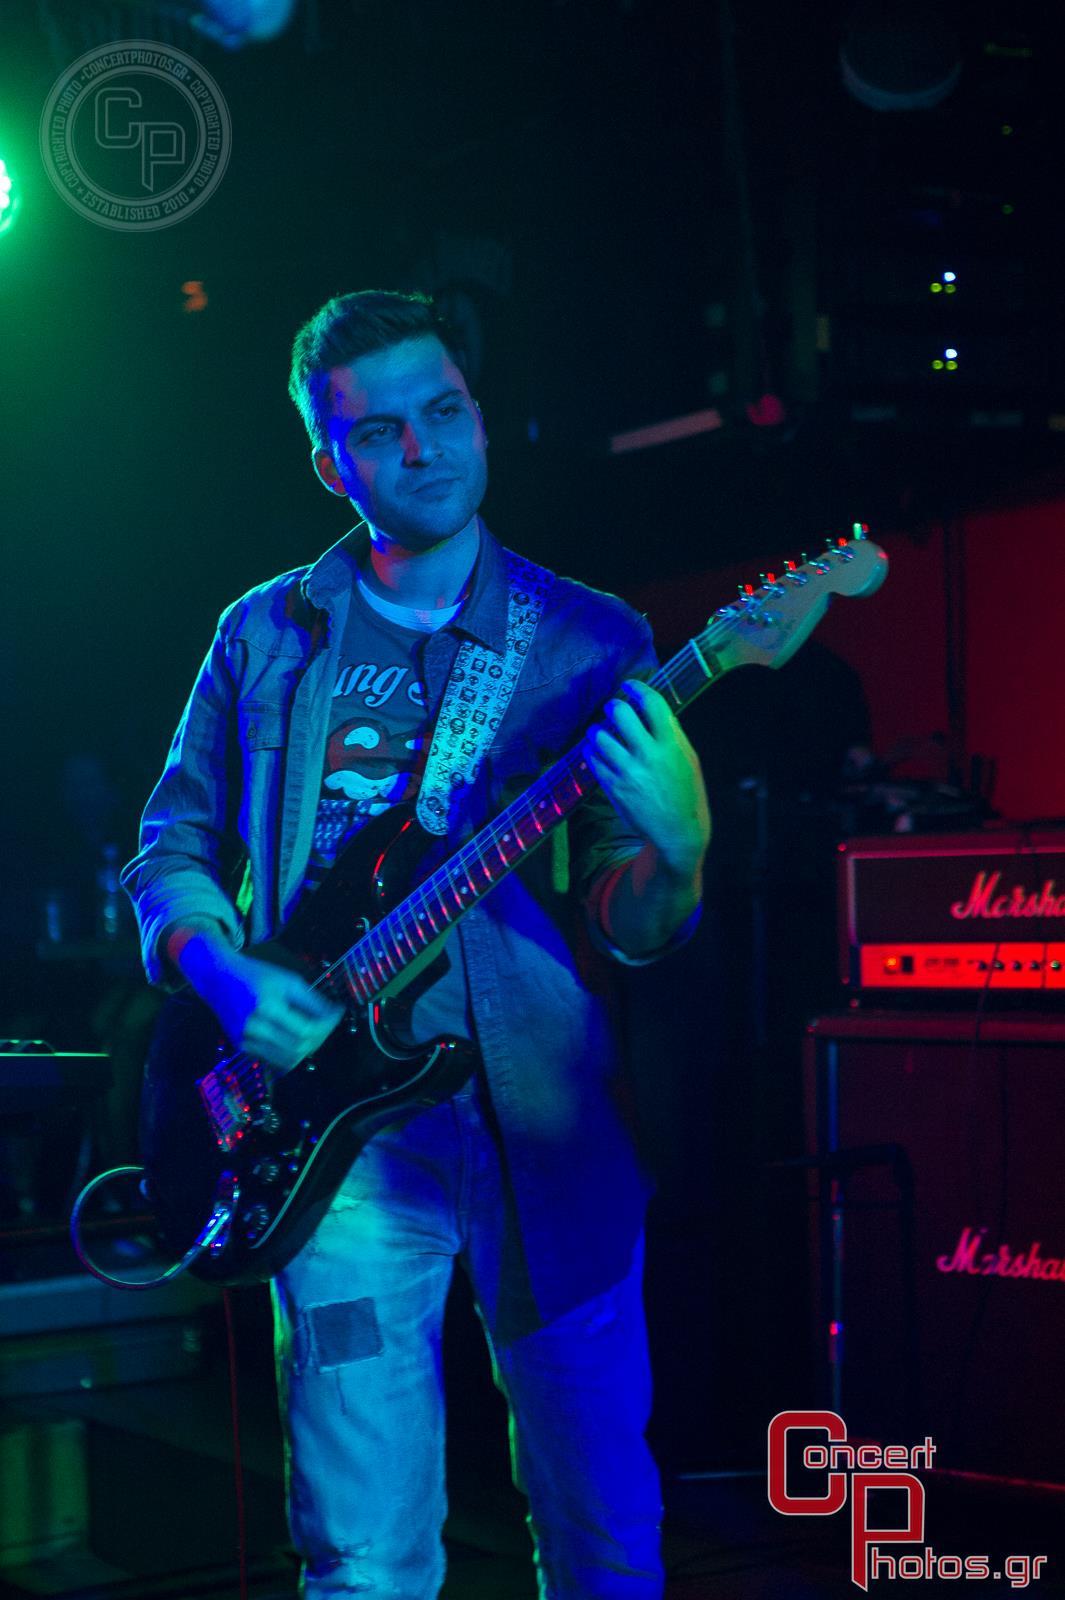 Battle Of The Bands Leg 1-Battle Of The Bands Leg 1 photographer:  - ConcertPhotos - 20141126_2320_14